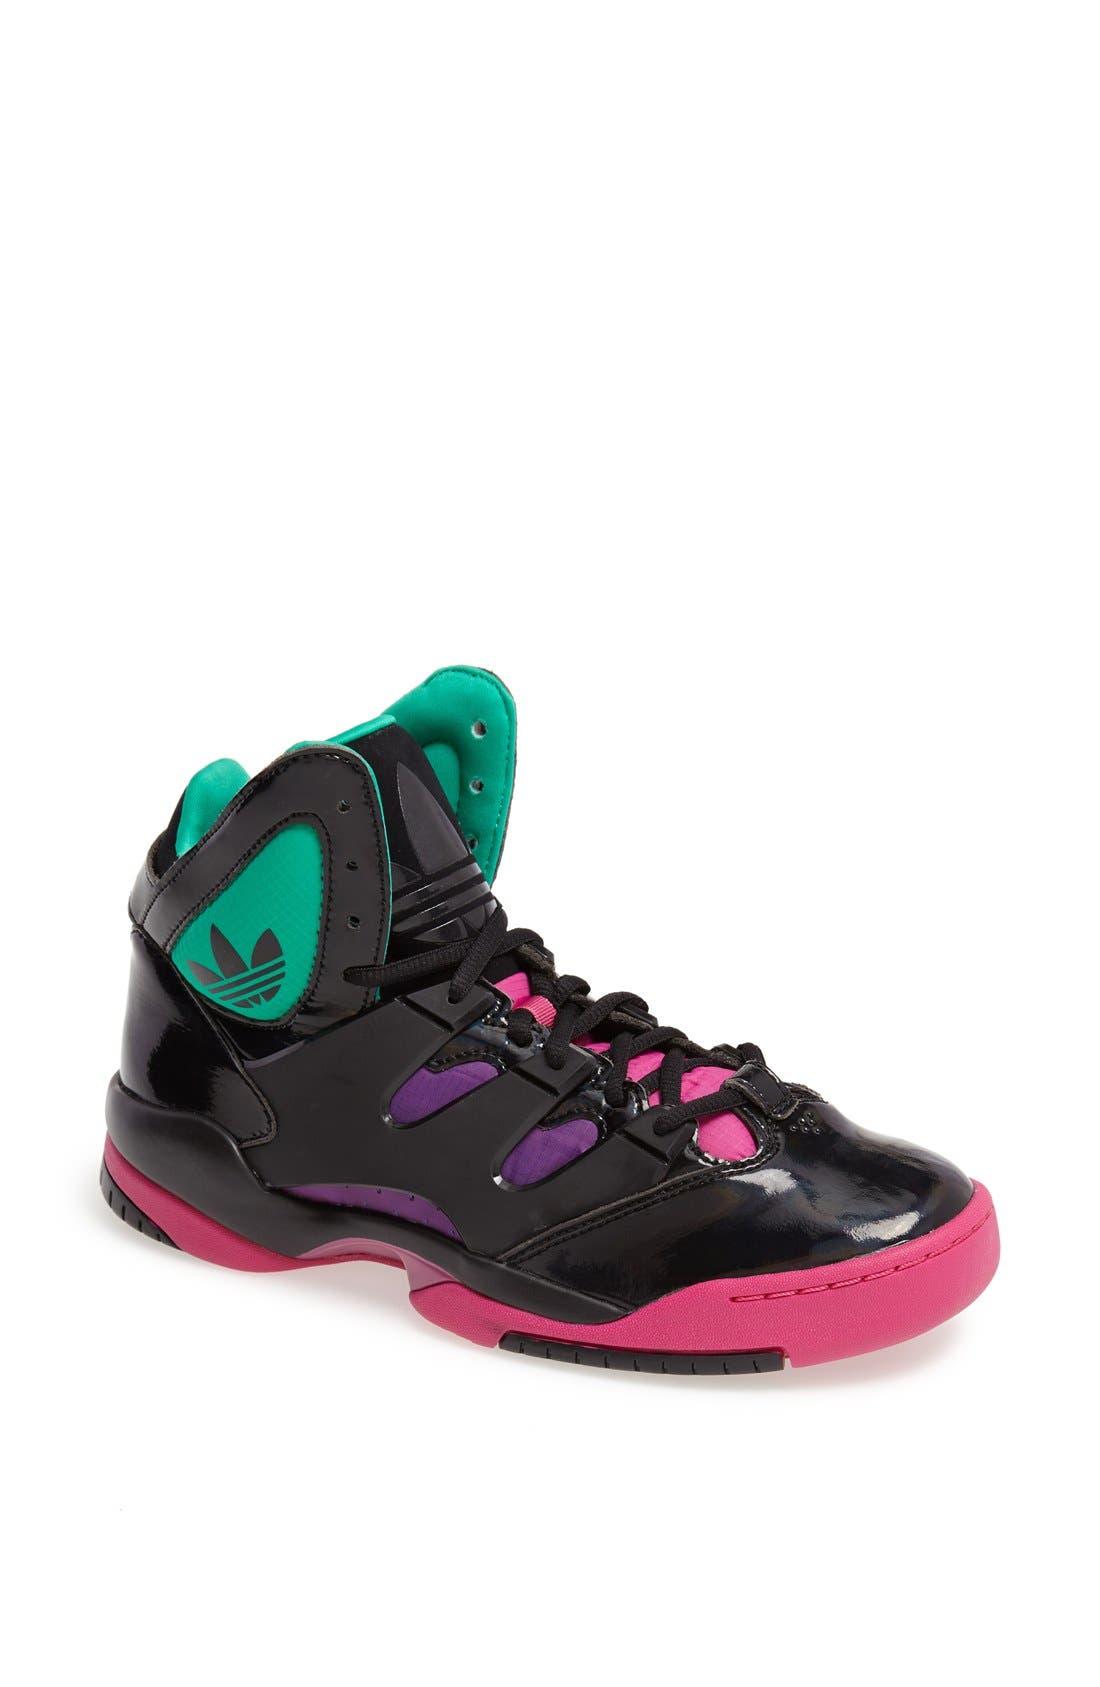 Main Image - adidas 'GLC' sneaker (Women)